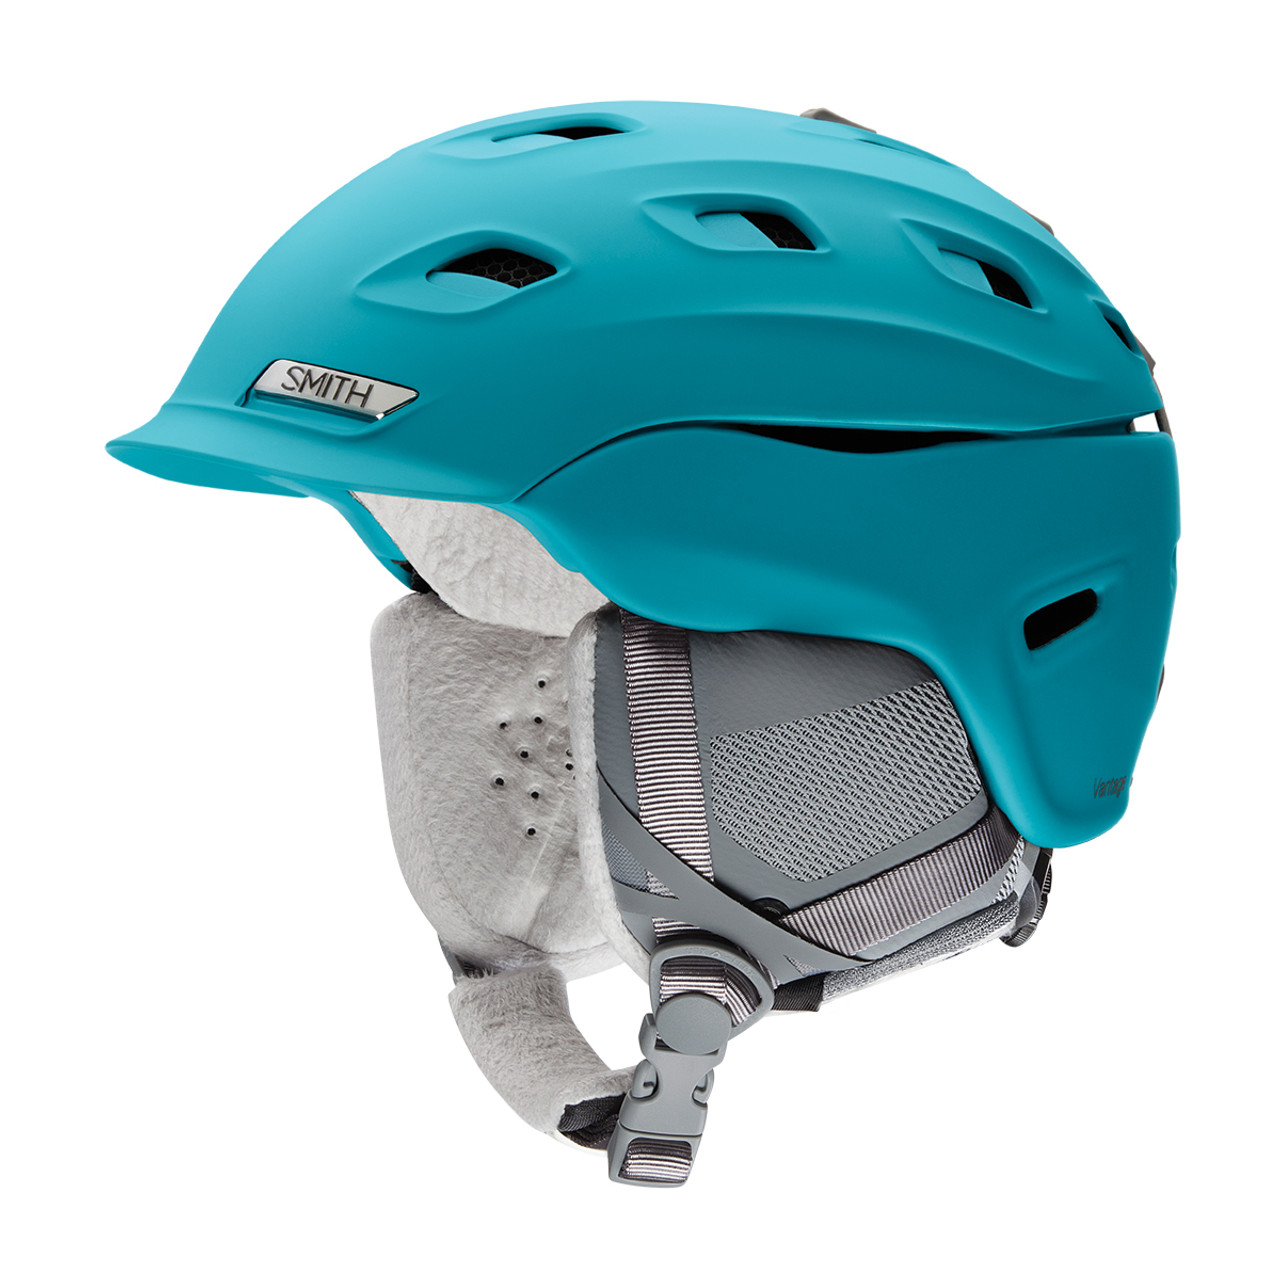 Smith Helmets | Women's Vantage | H18VAW18 | Color: Matte Mineral